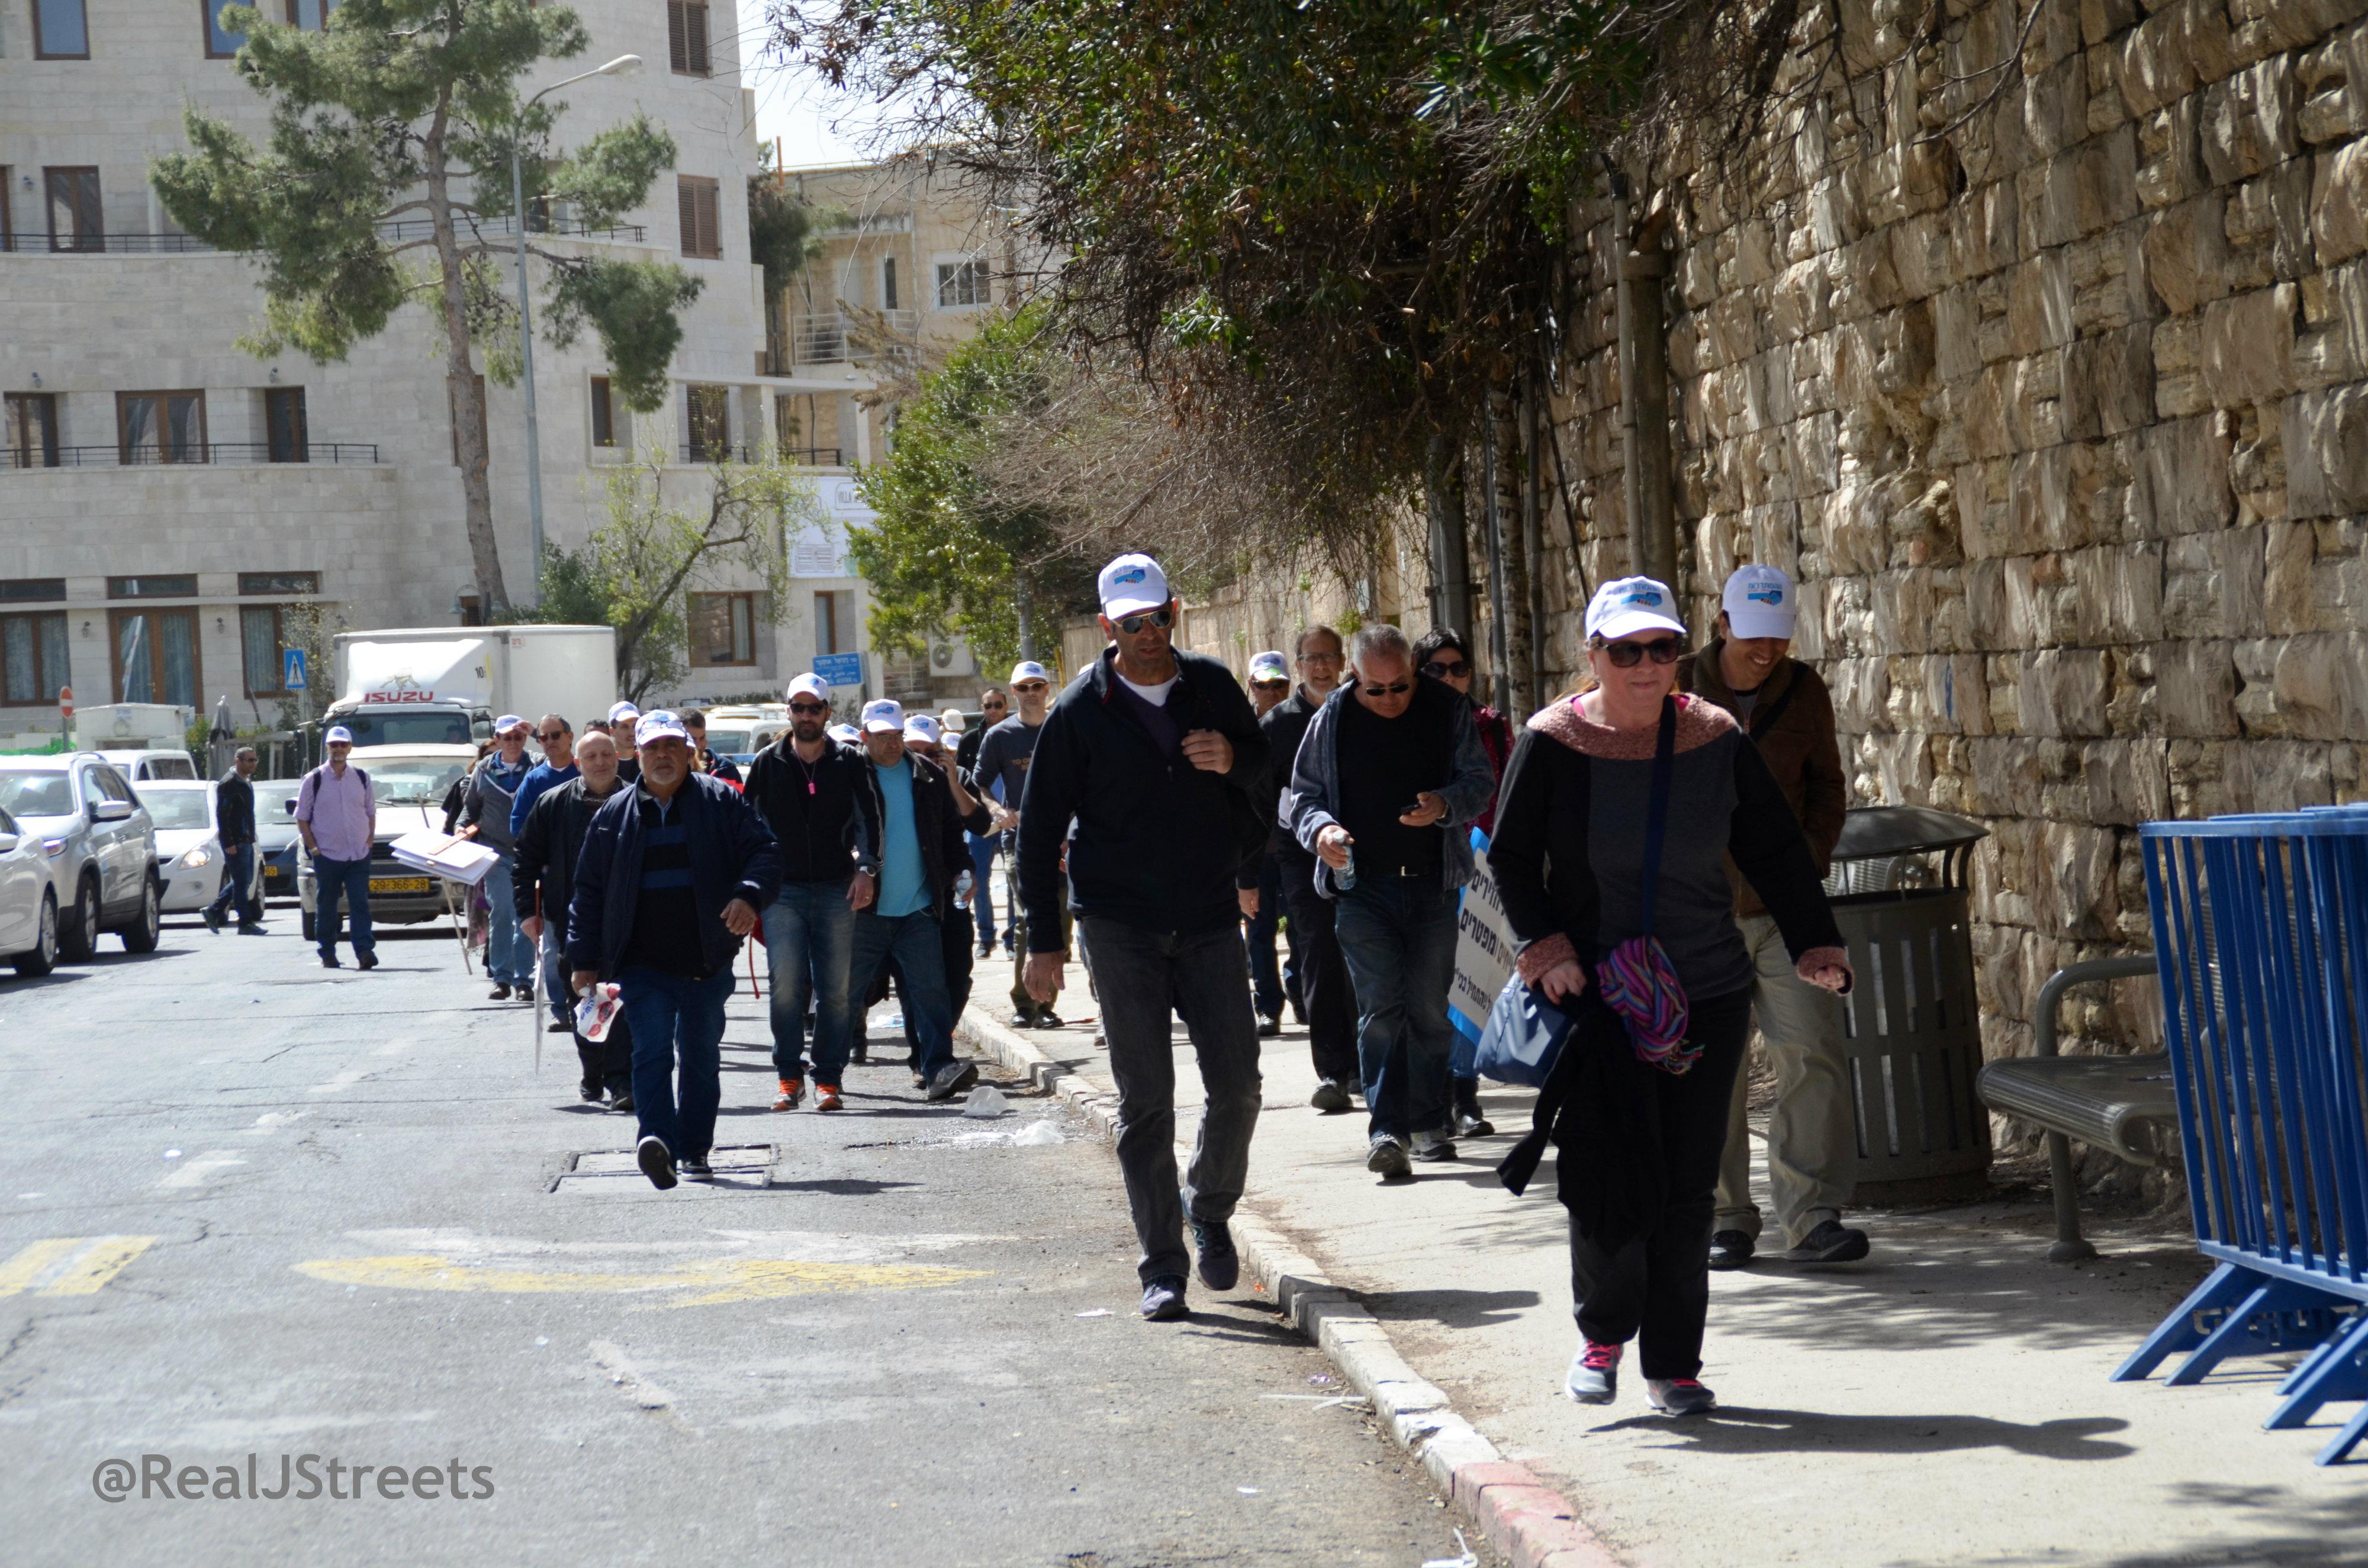 people leaving rally